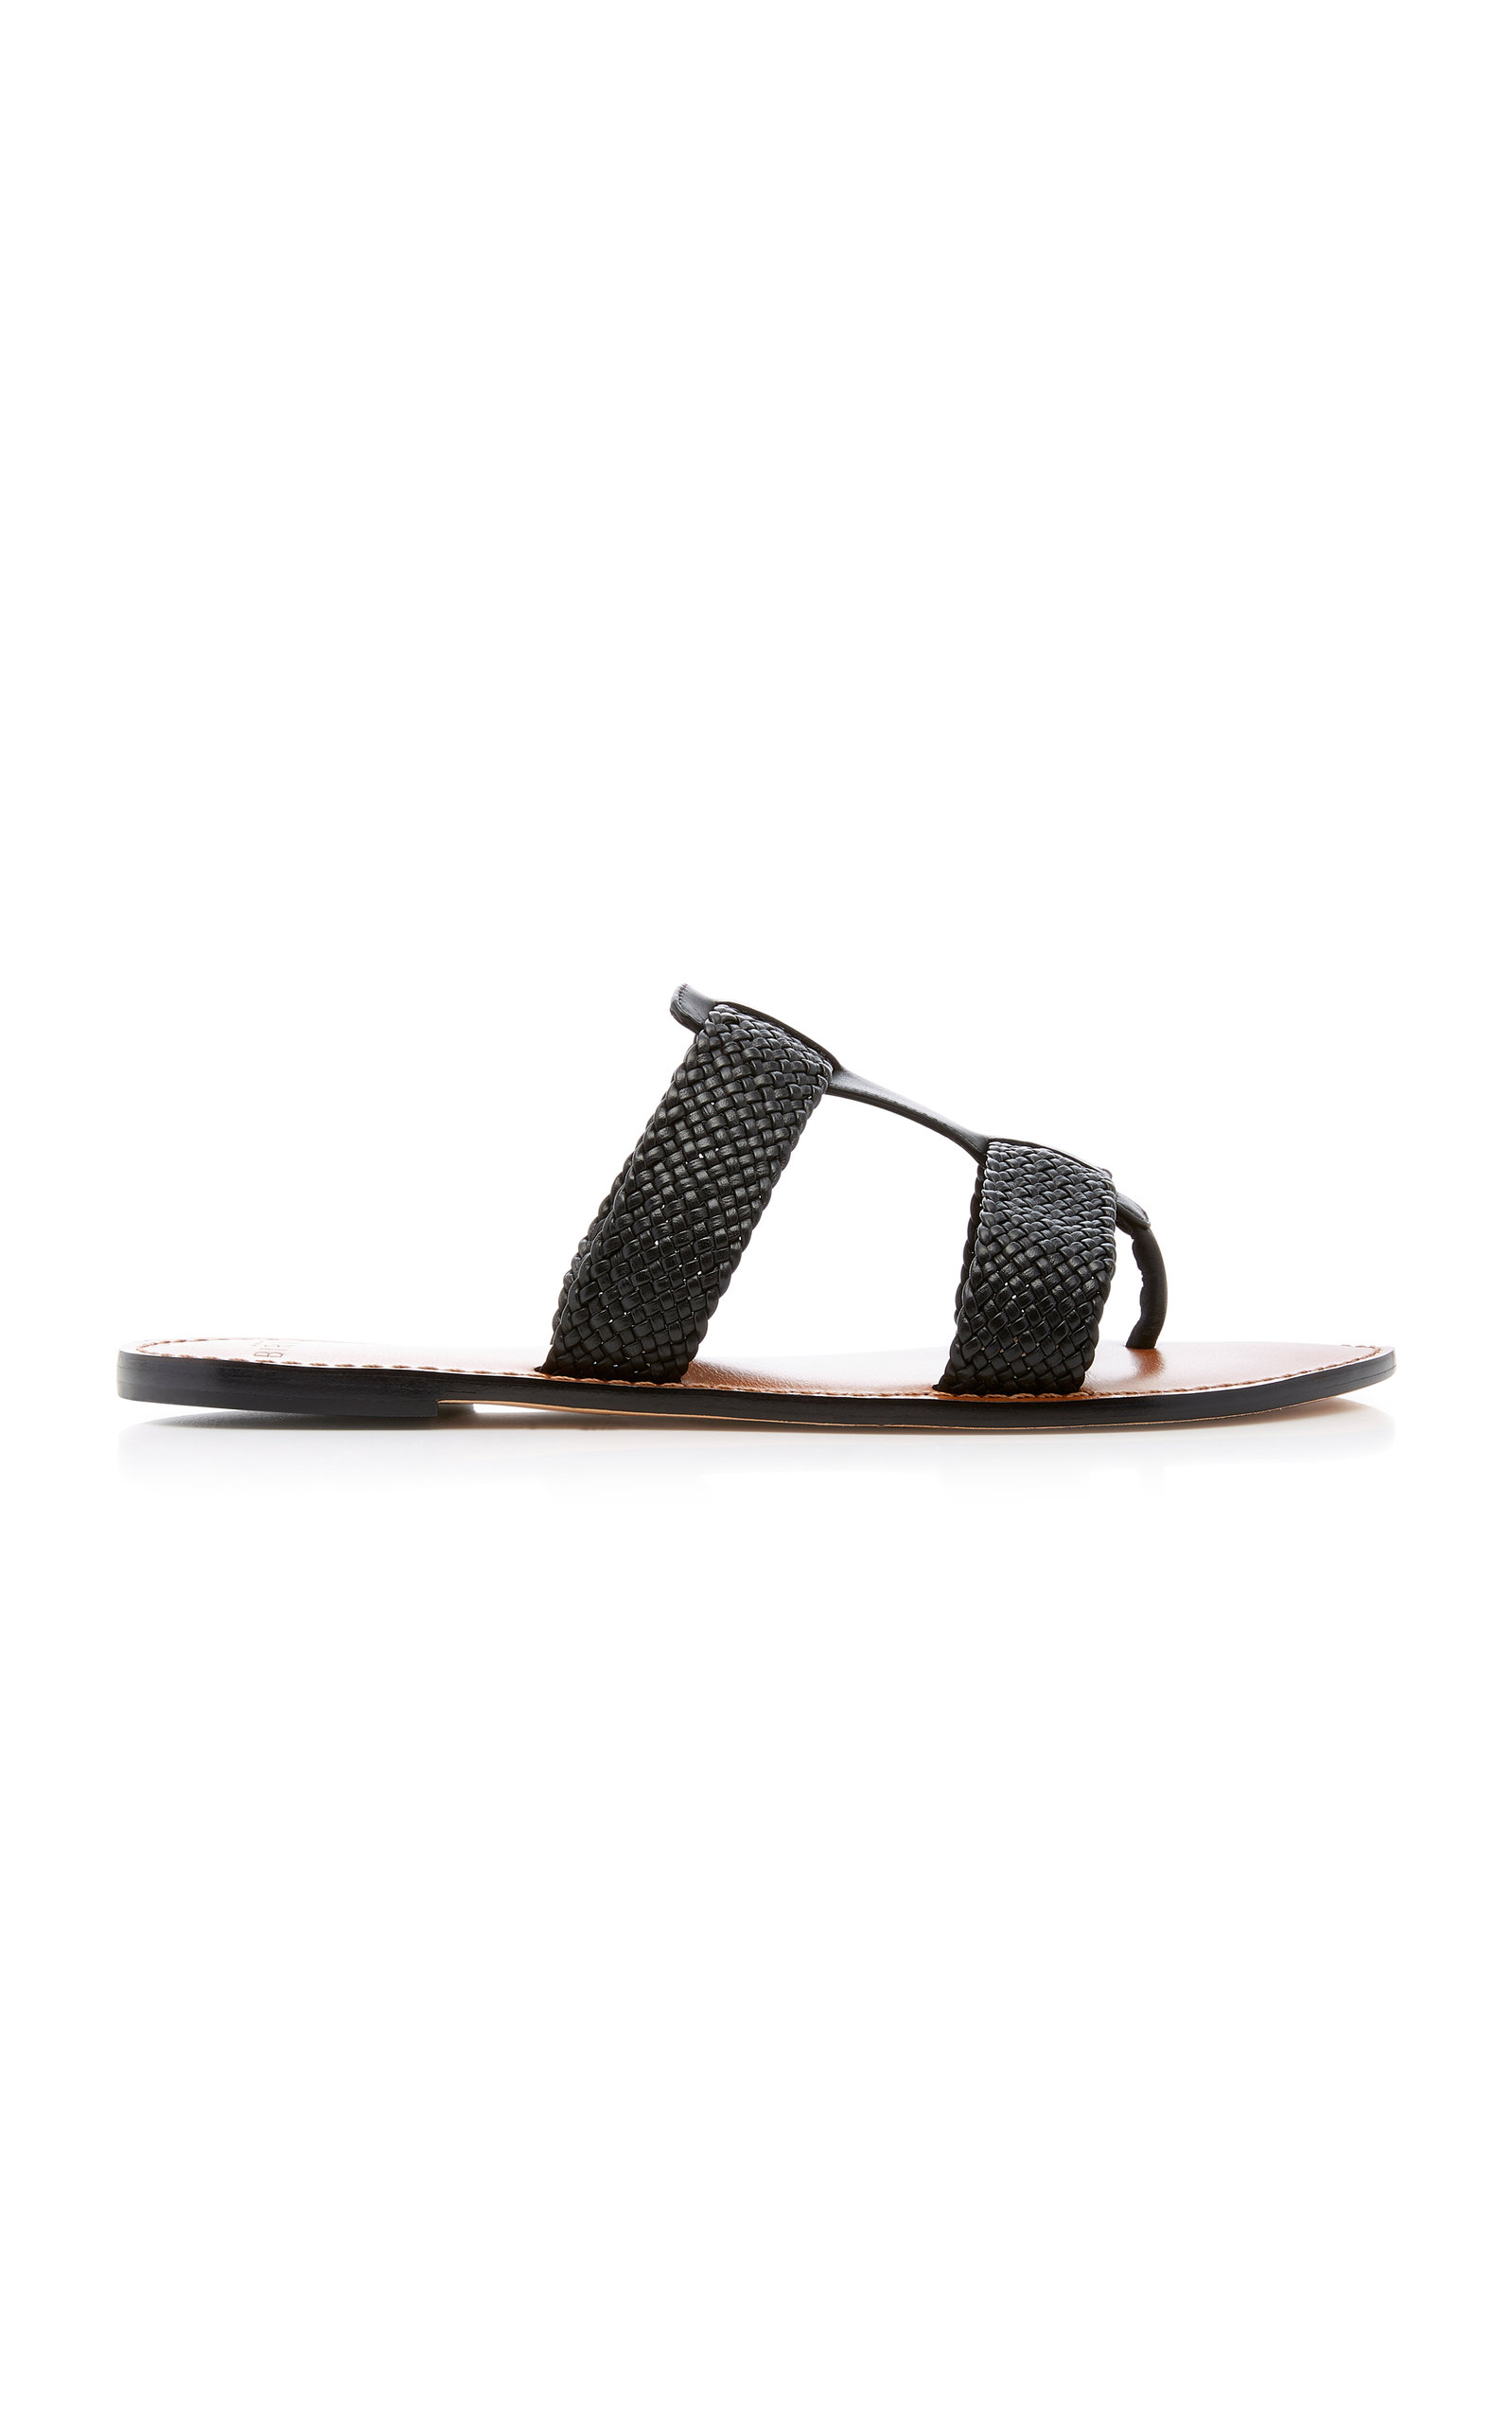 new concept 06088 2e289 large alexandre-birman-black-woven-leather-sandals.jpg